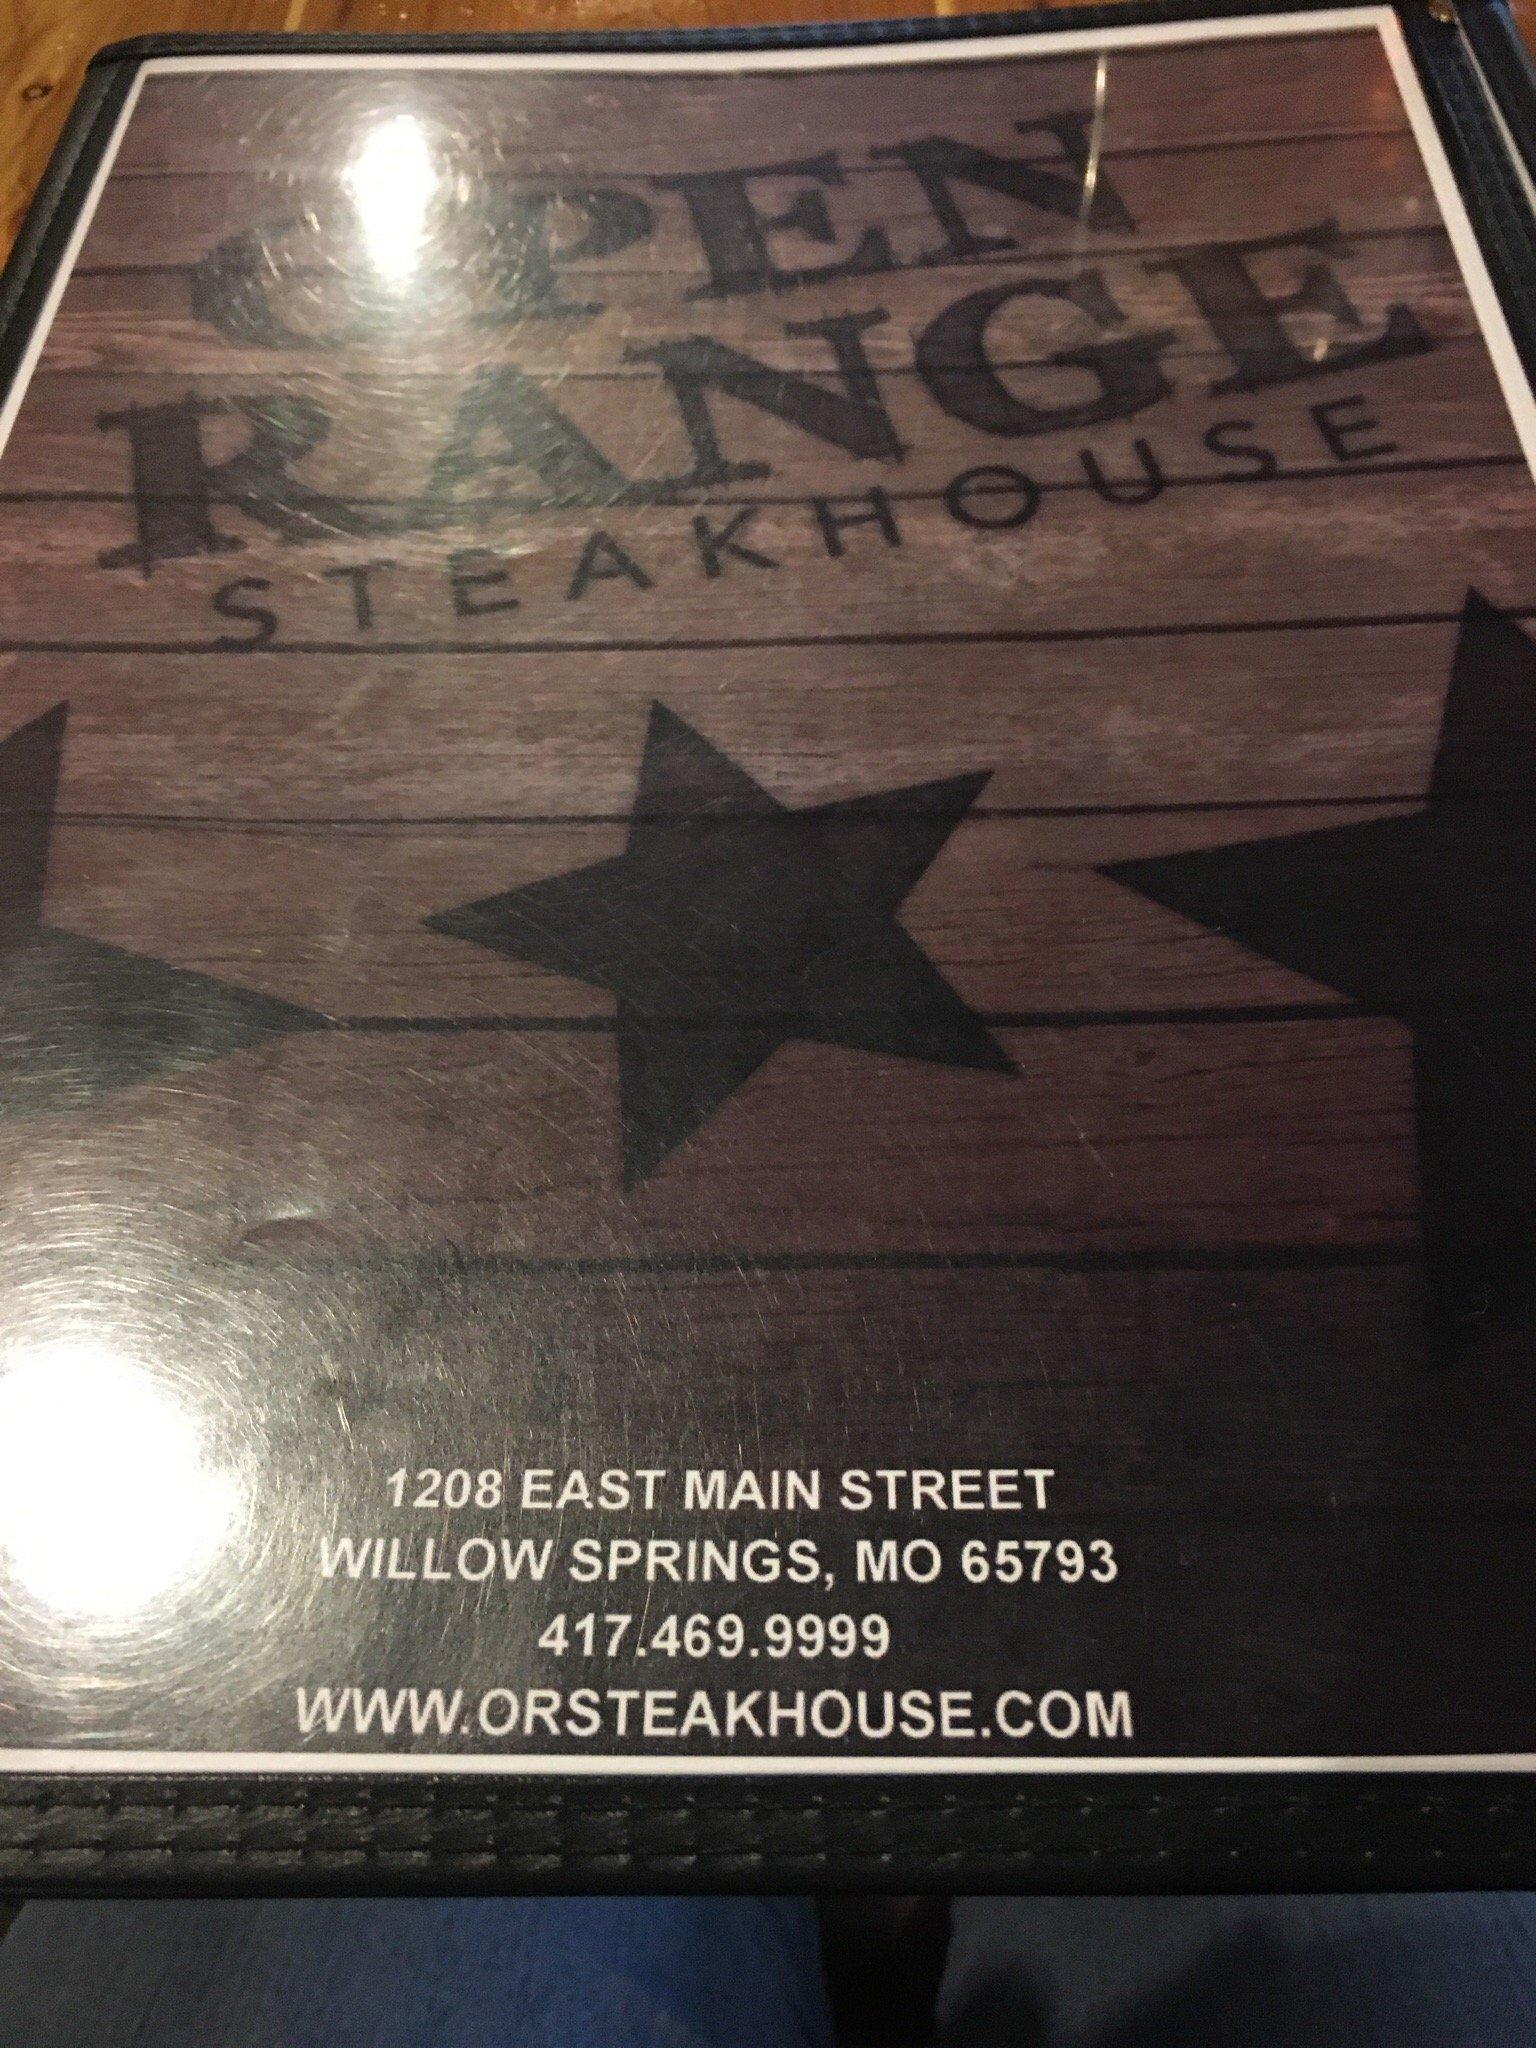 Us Area Code Range%0A Open Range Steakhouse  Willow Springs  Menu  Prices  u     Restaurant Reviews   TripAdvisor